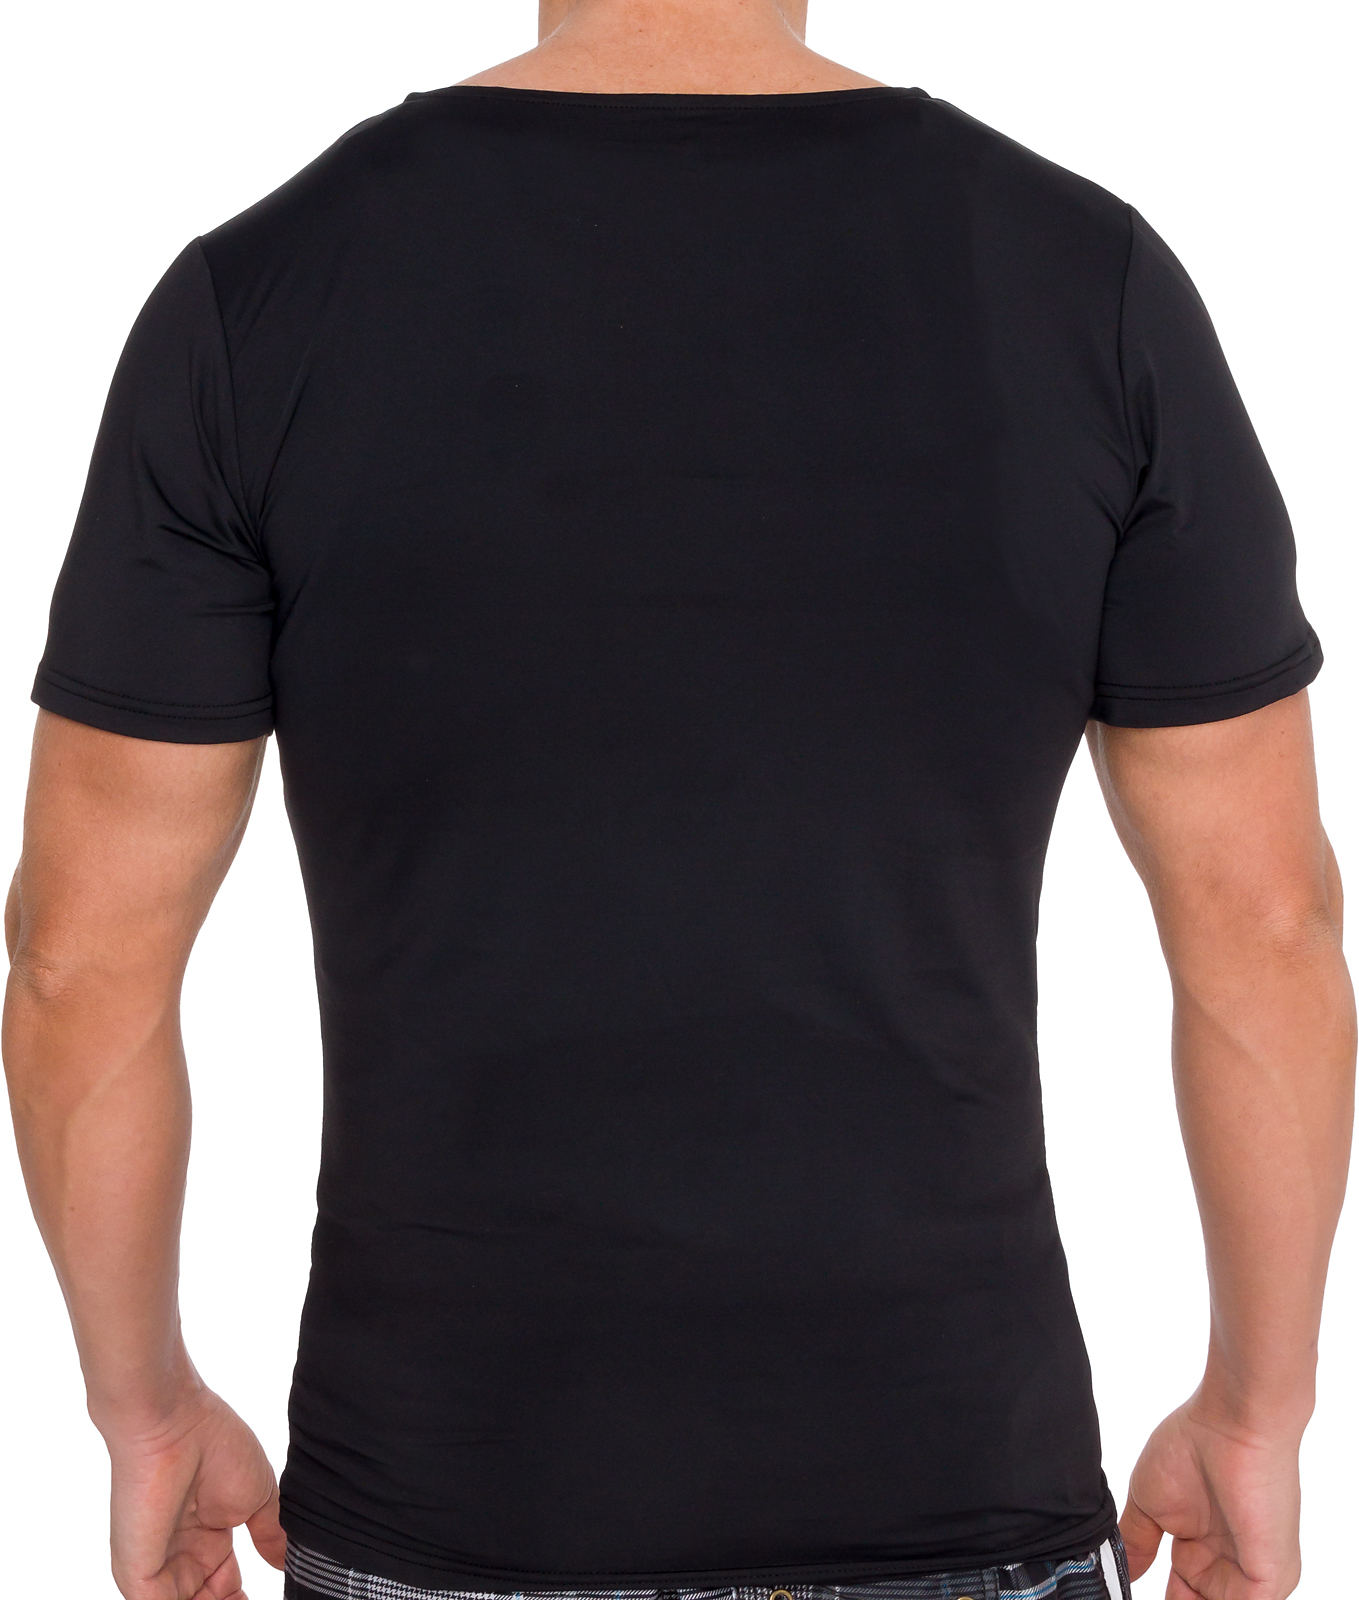 LISH-Men-039-s-Slimming-Compression-Body-Shaper-Gynecomastia-Undershirt thumbnail 10